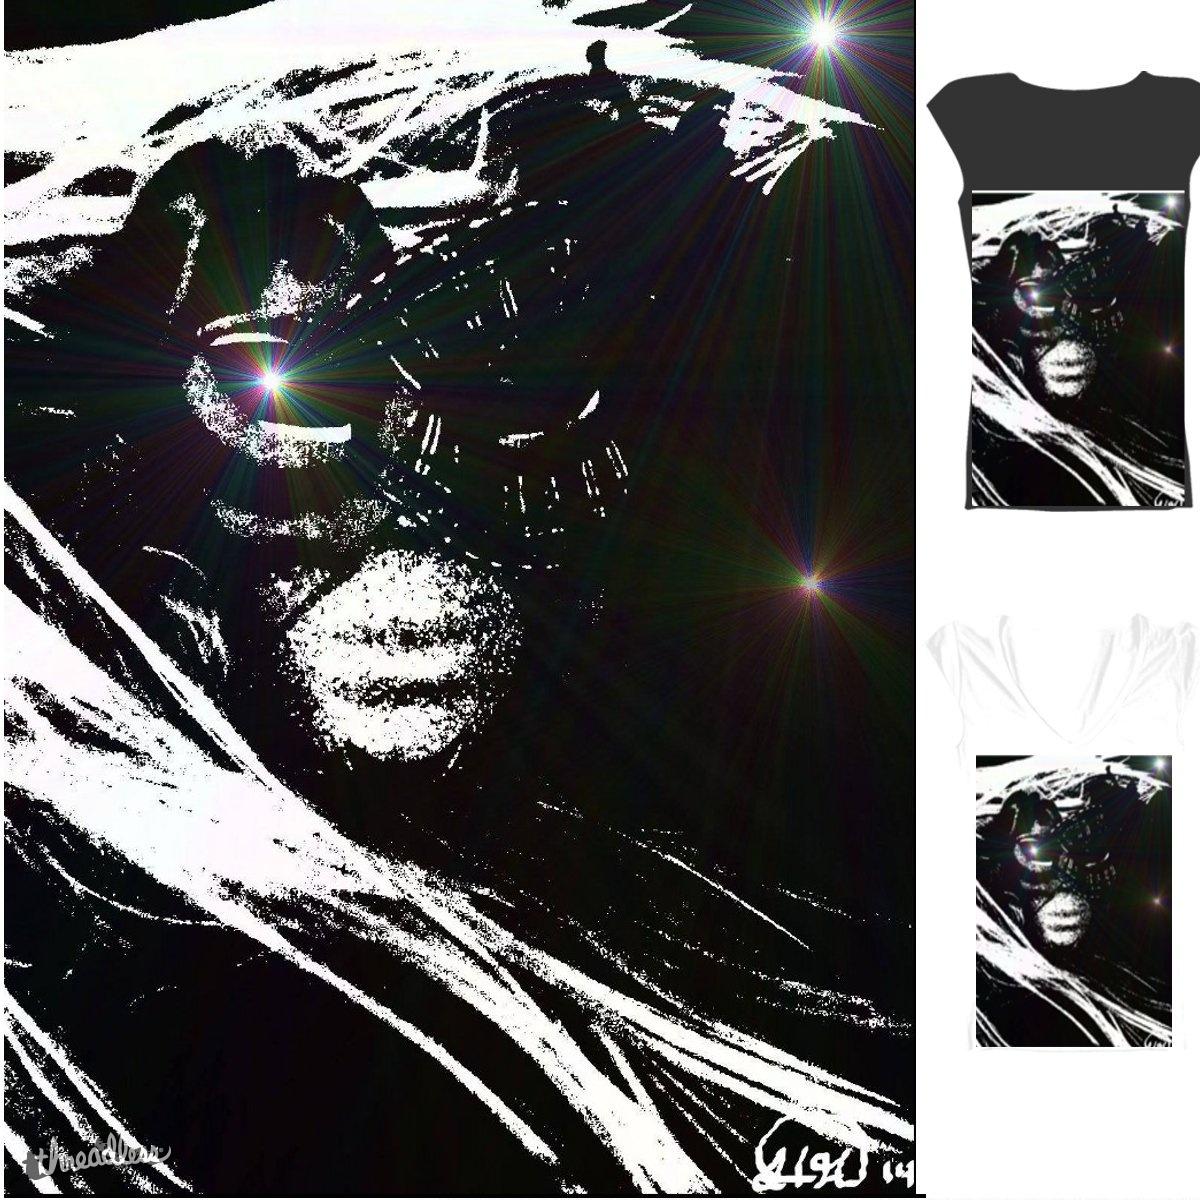 The Cosmic Mask by fleasonkitty on Threadless